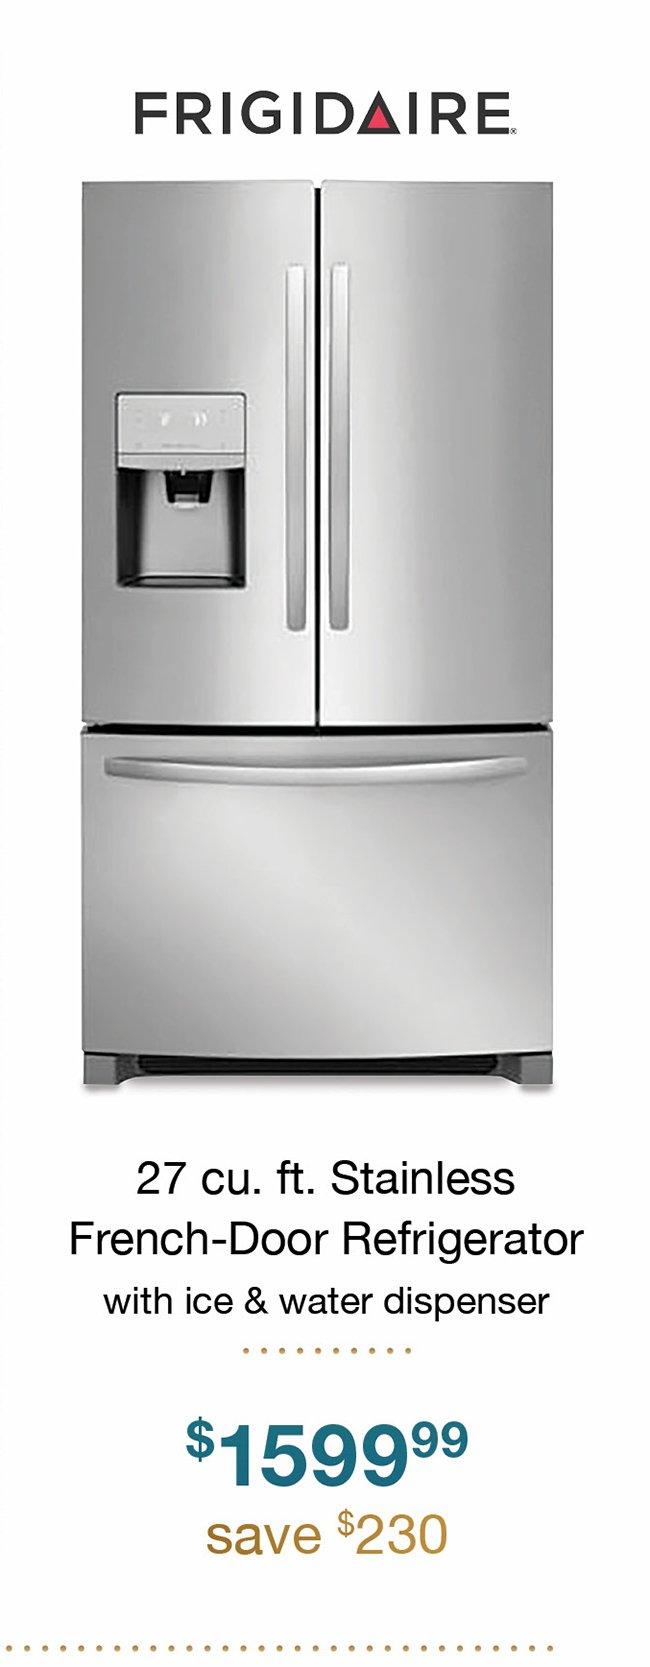 Frigidaire-french-door-refrigerator